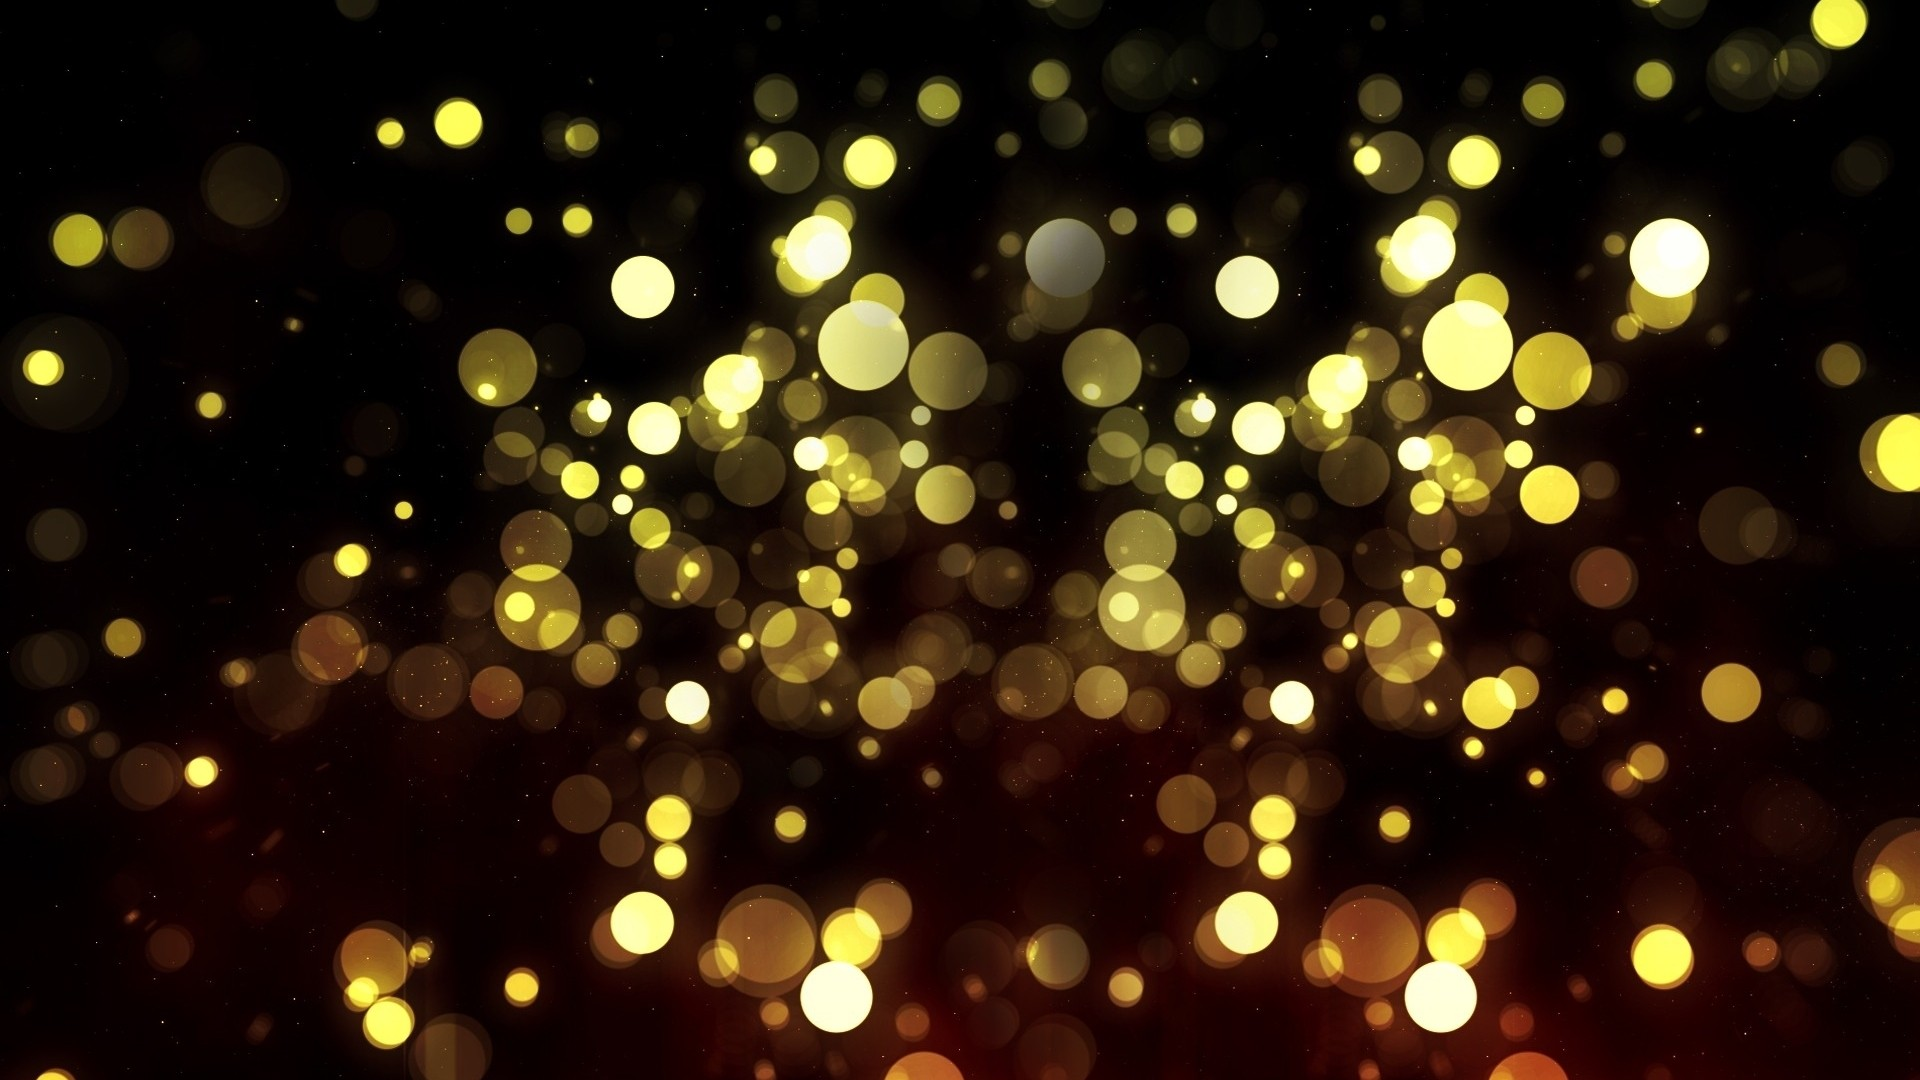 Best Wallpaper Home Screen Glitter - 225263-amazing-gold-sparkle-background-1920x1080-for-mac  Trends_82177.jpg